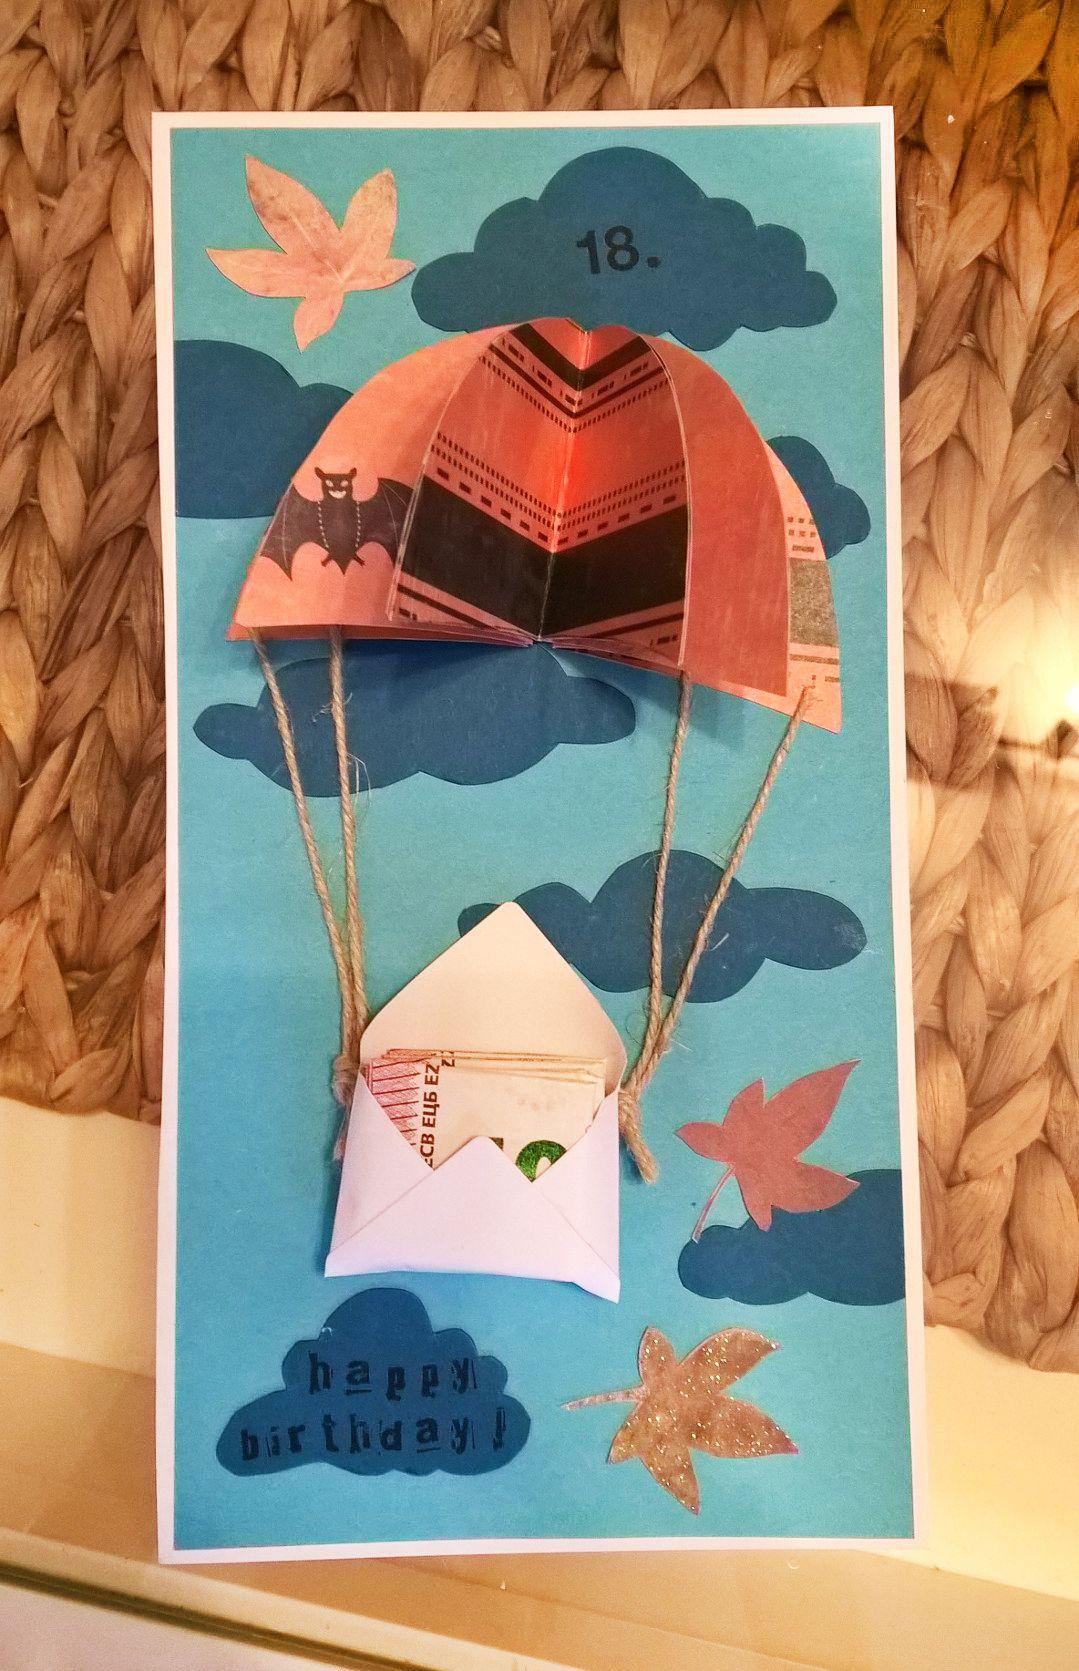 geburtstagskarte geldgeschenk herbst fallschirm karten geschenke papier pinterest. Black Bedroom Furniture Sets. Home Design Ideas